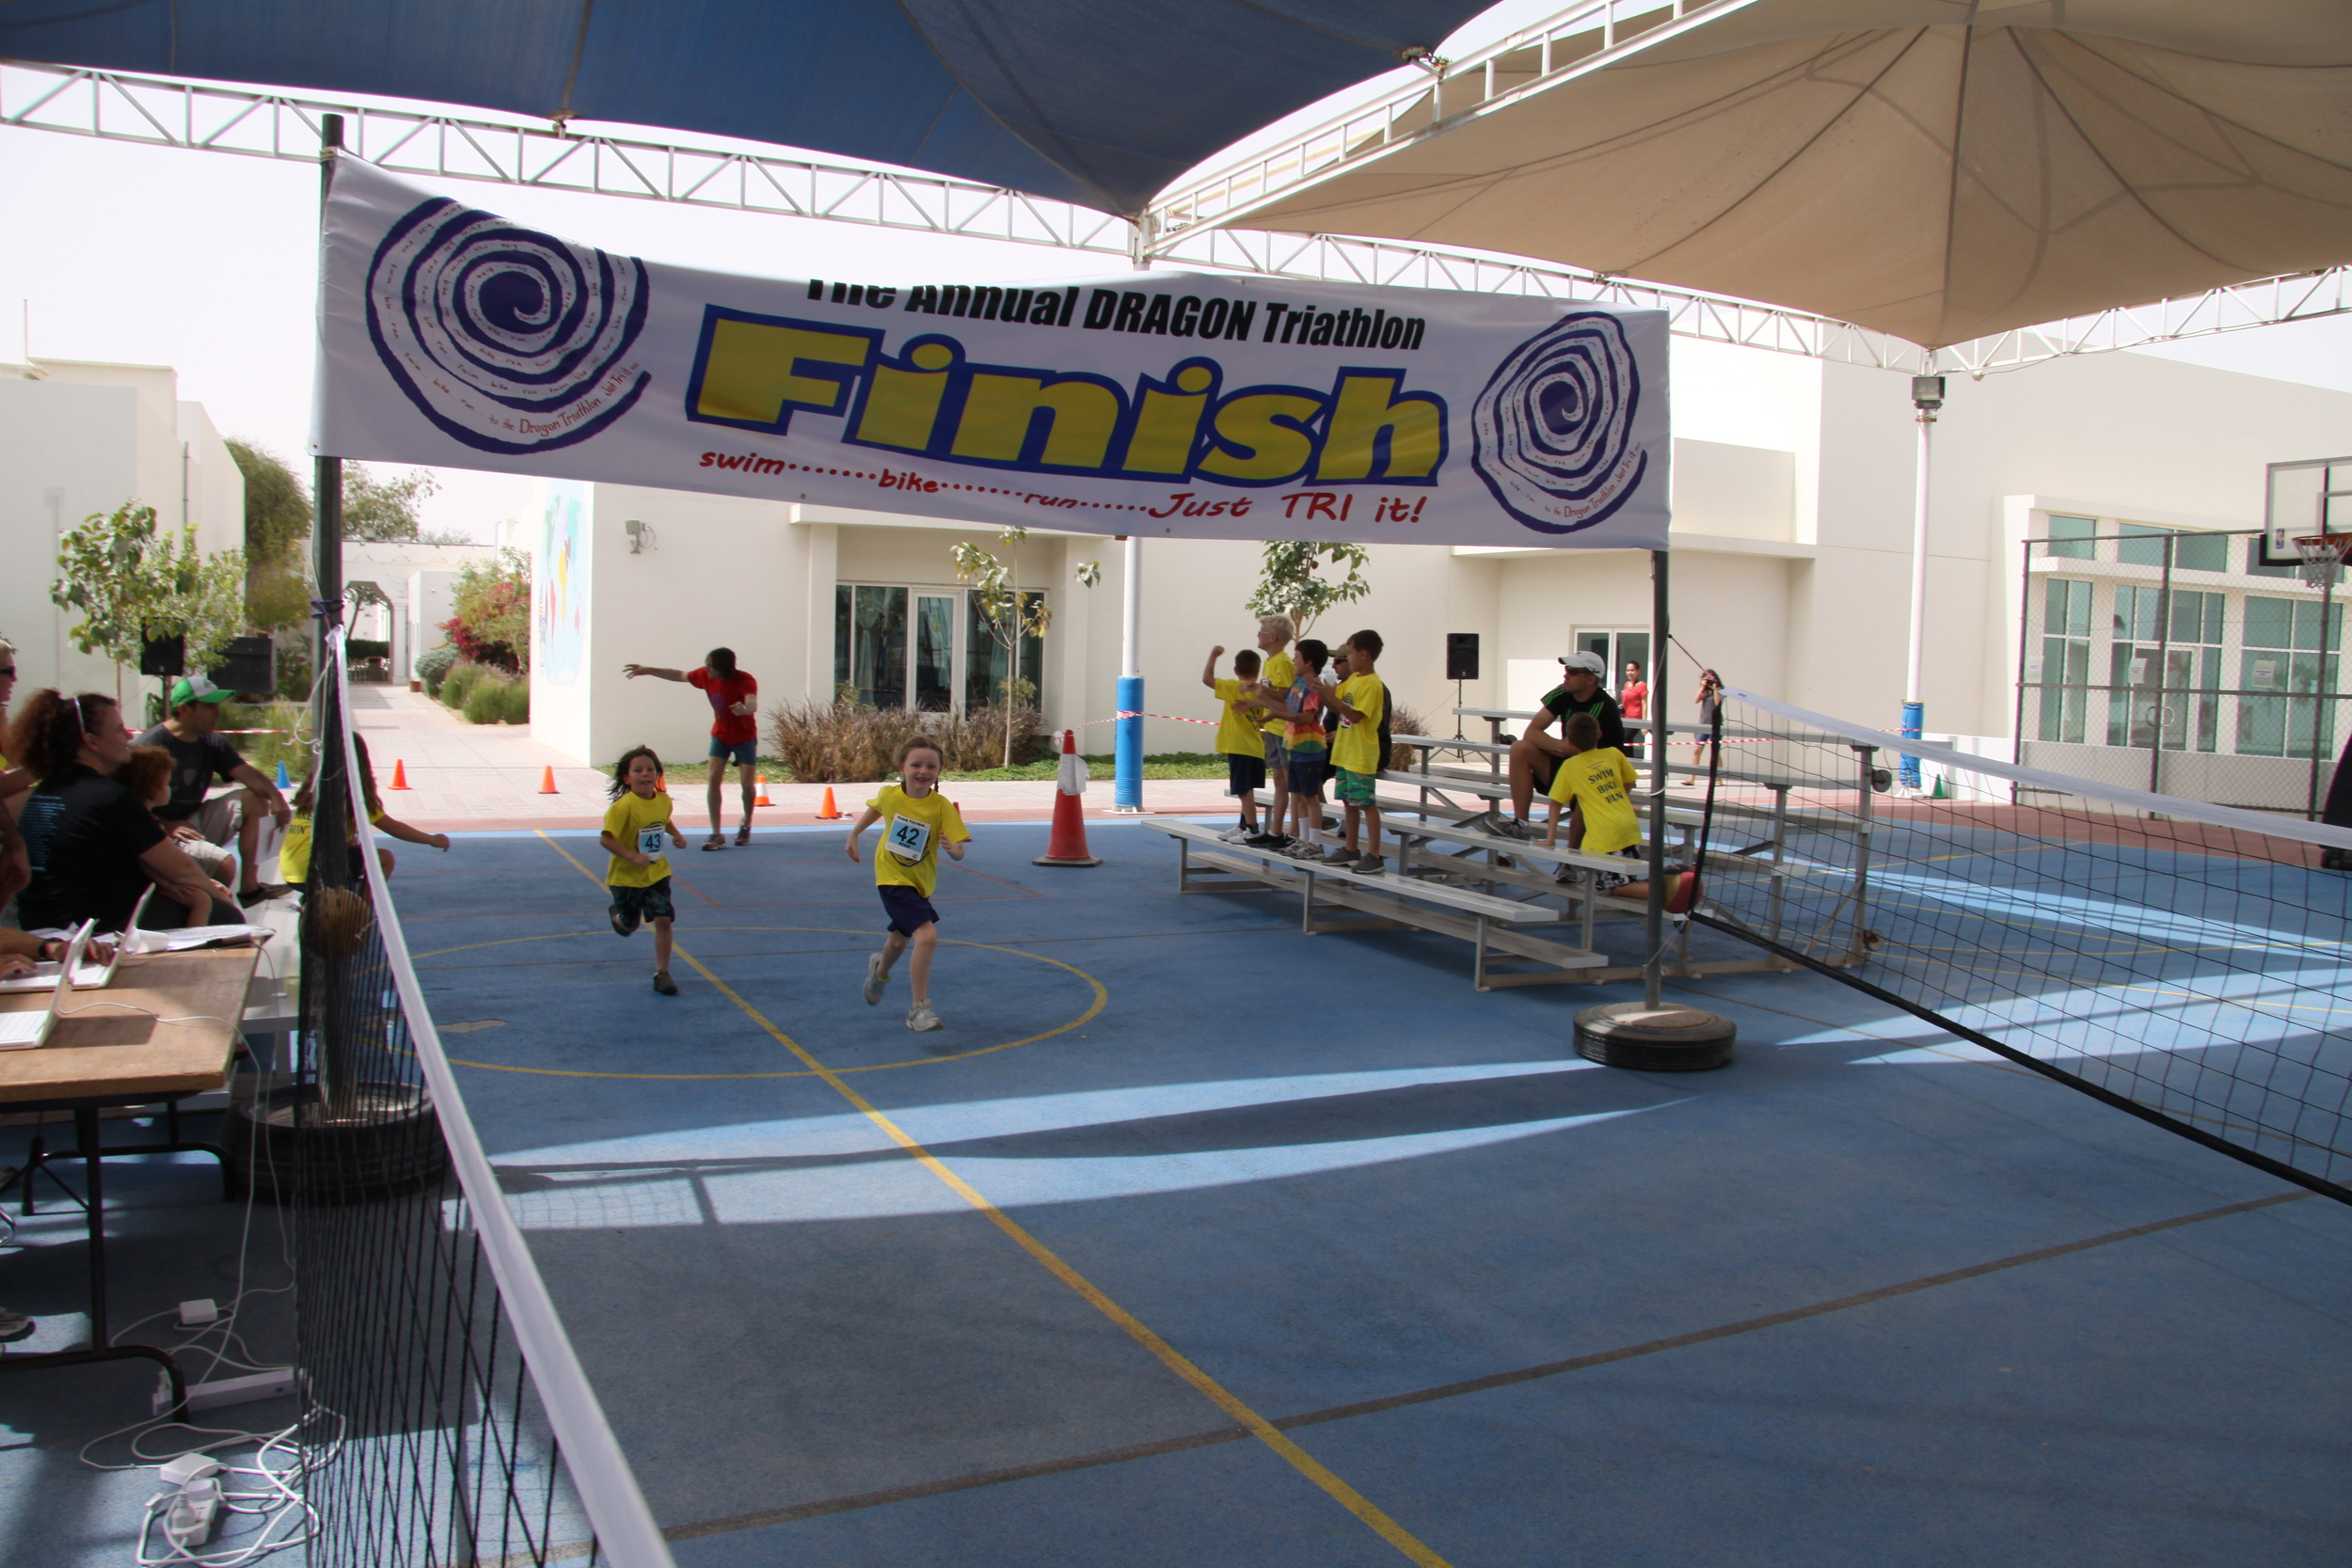 Crossing the Finish Line - Triathlon 2012!